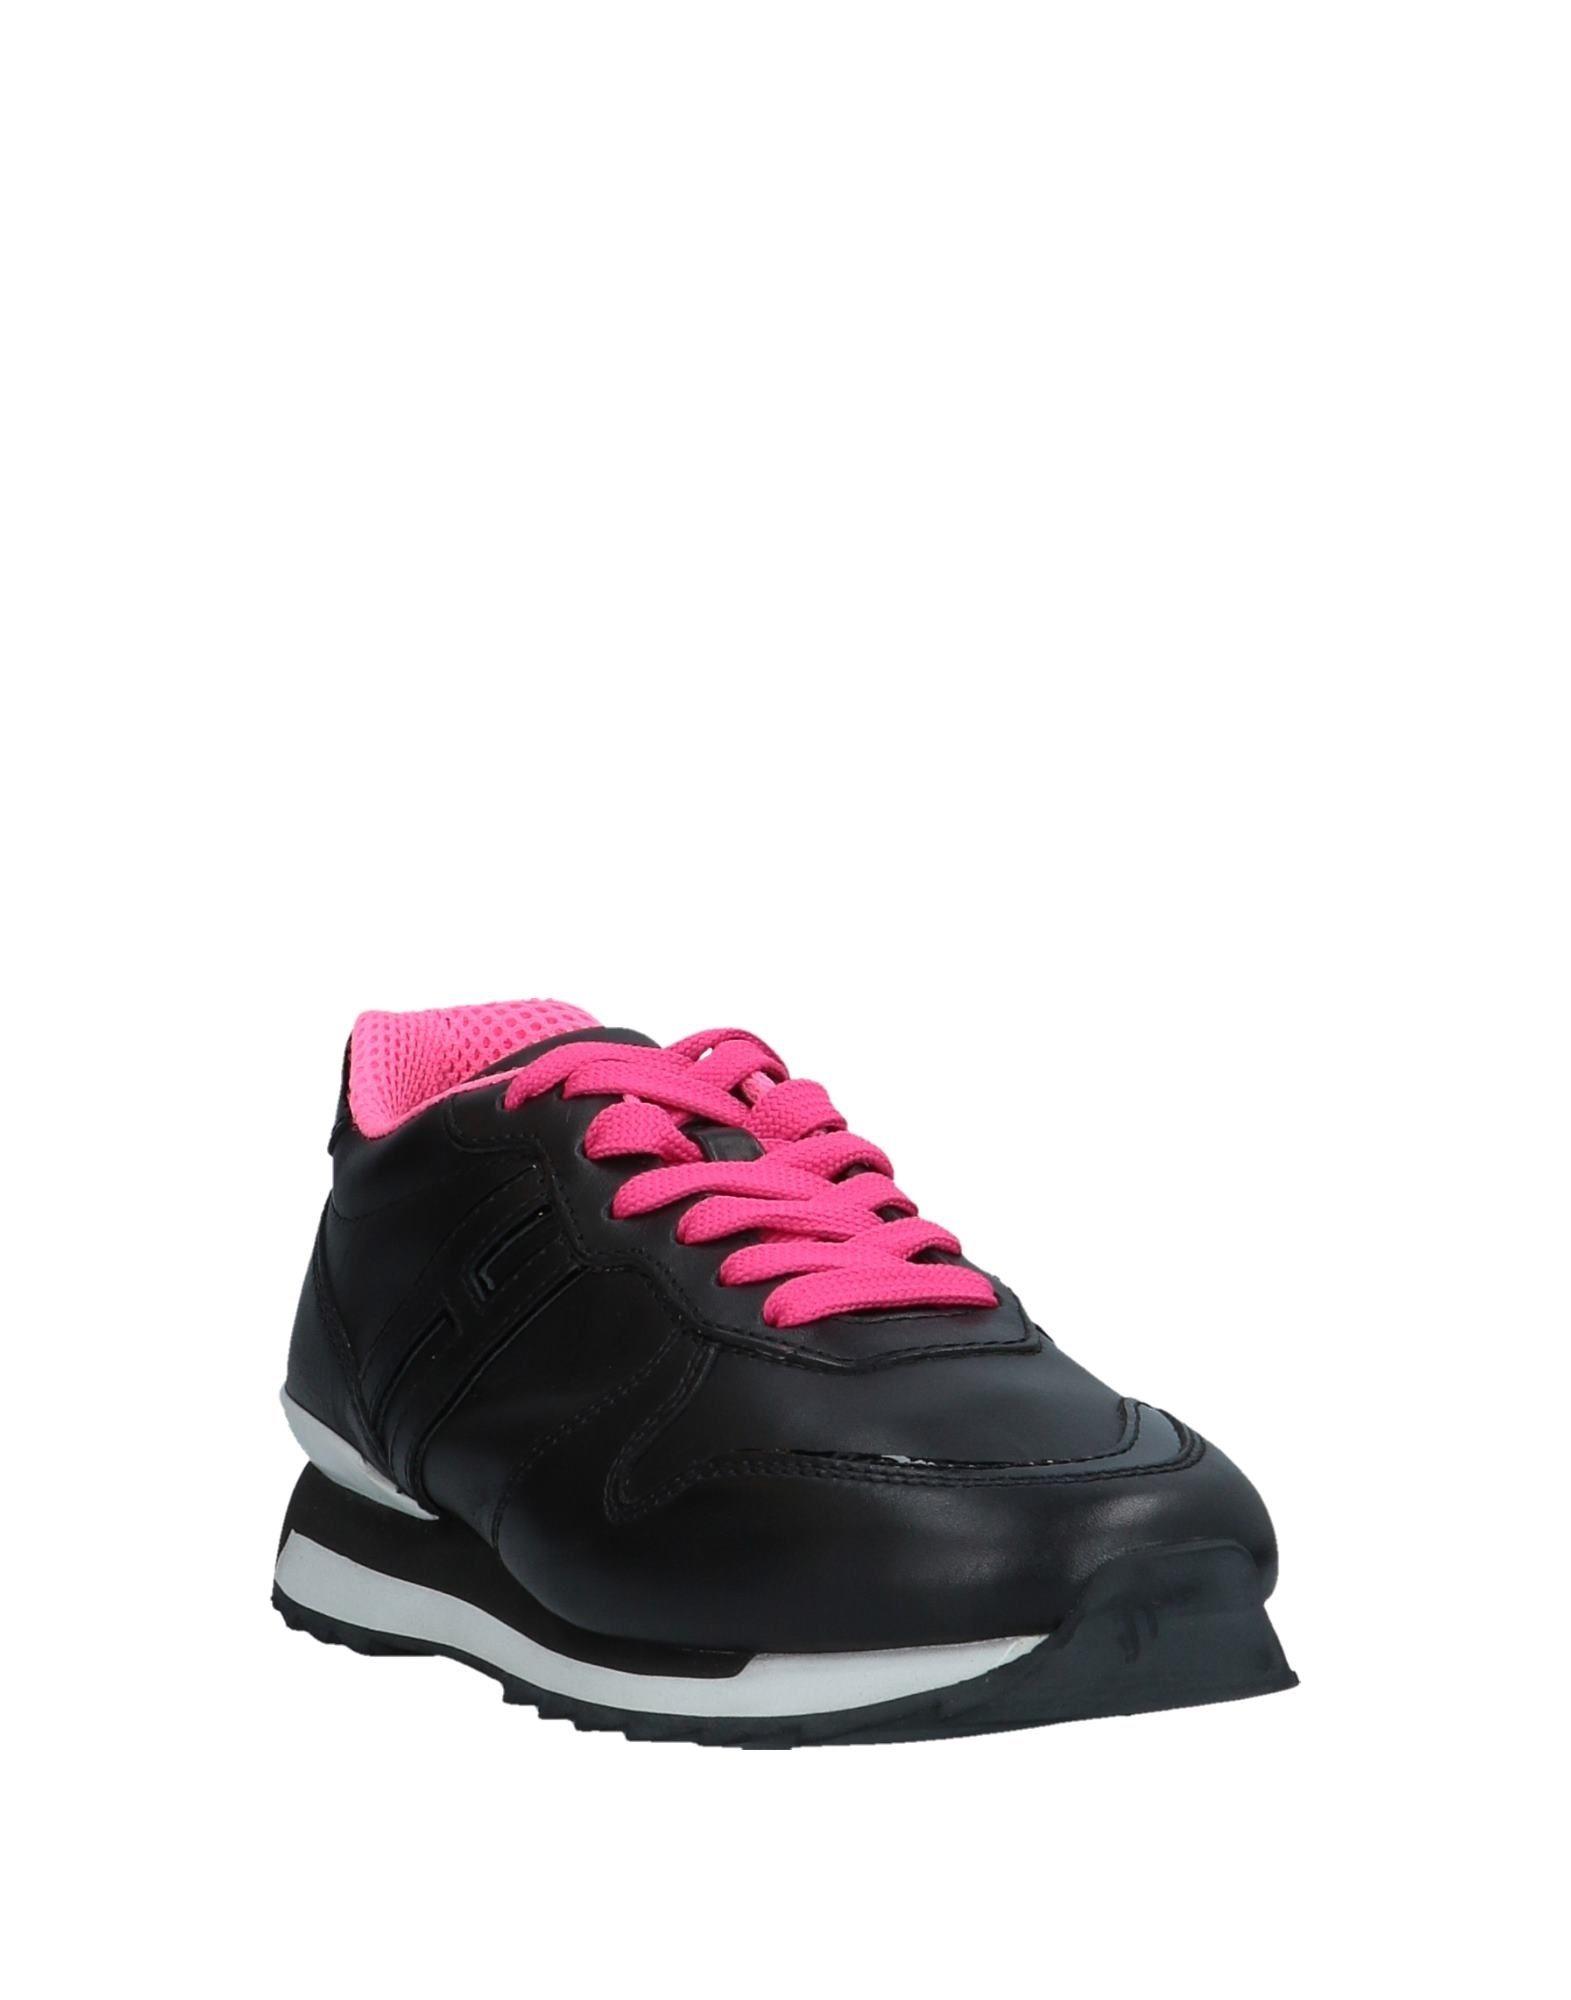 Hogan Hogan Hogan Rebel Sneakers Damen  11539804UA Beliebte Schuhe db68a0